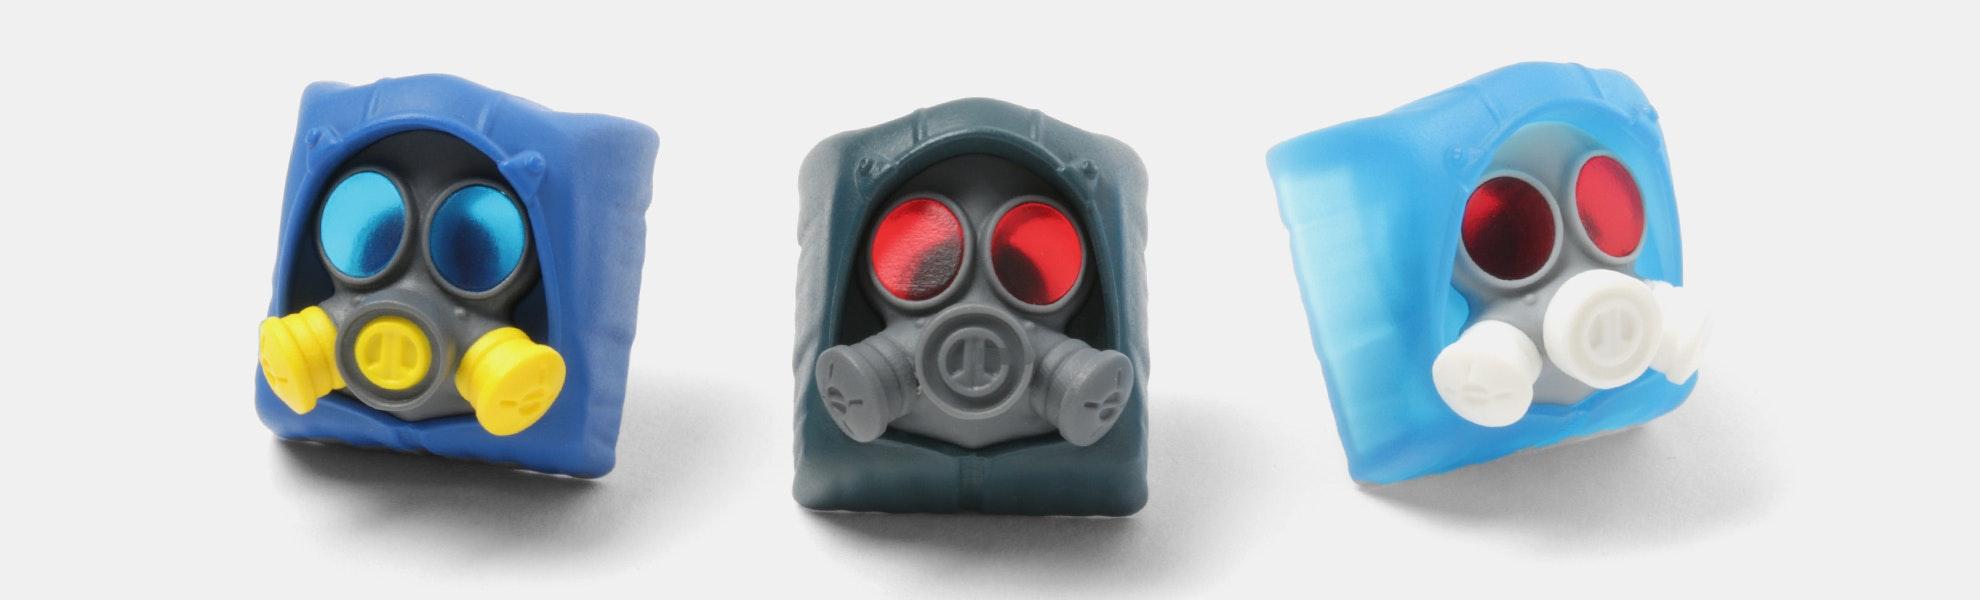 Hot Keys Project Specter Artisan Keycaps